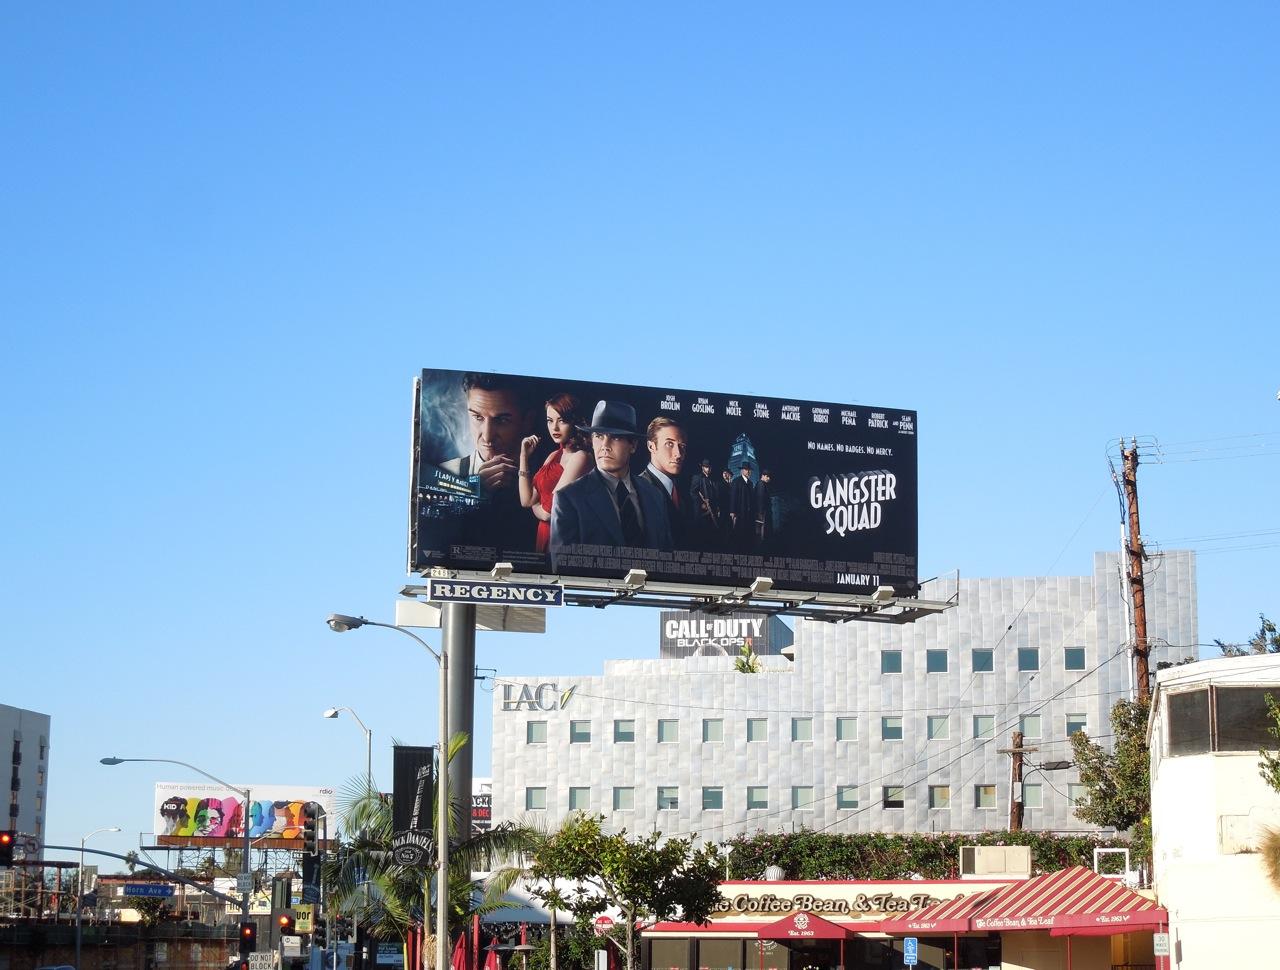 http://2.bp.blogspot.com/-dogoKS384FI/UNdIr3h1mqI/AAAAAAAA72o/i8bu4BrEqKw/s1600/Gangster+Squad+billboard.jpg